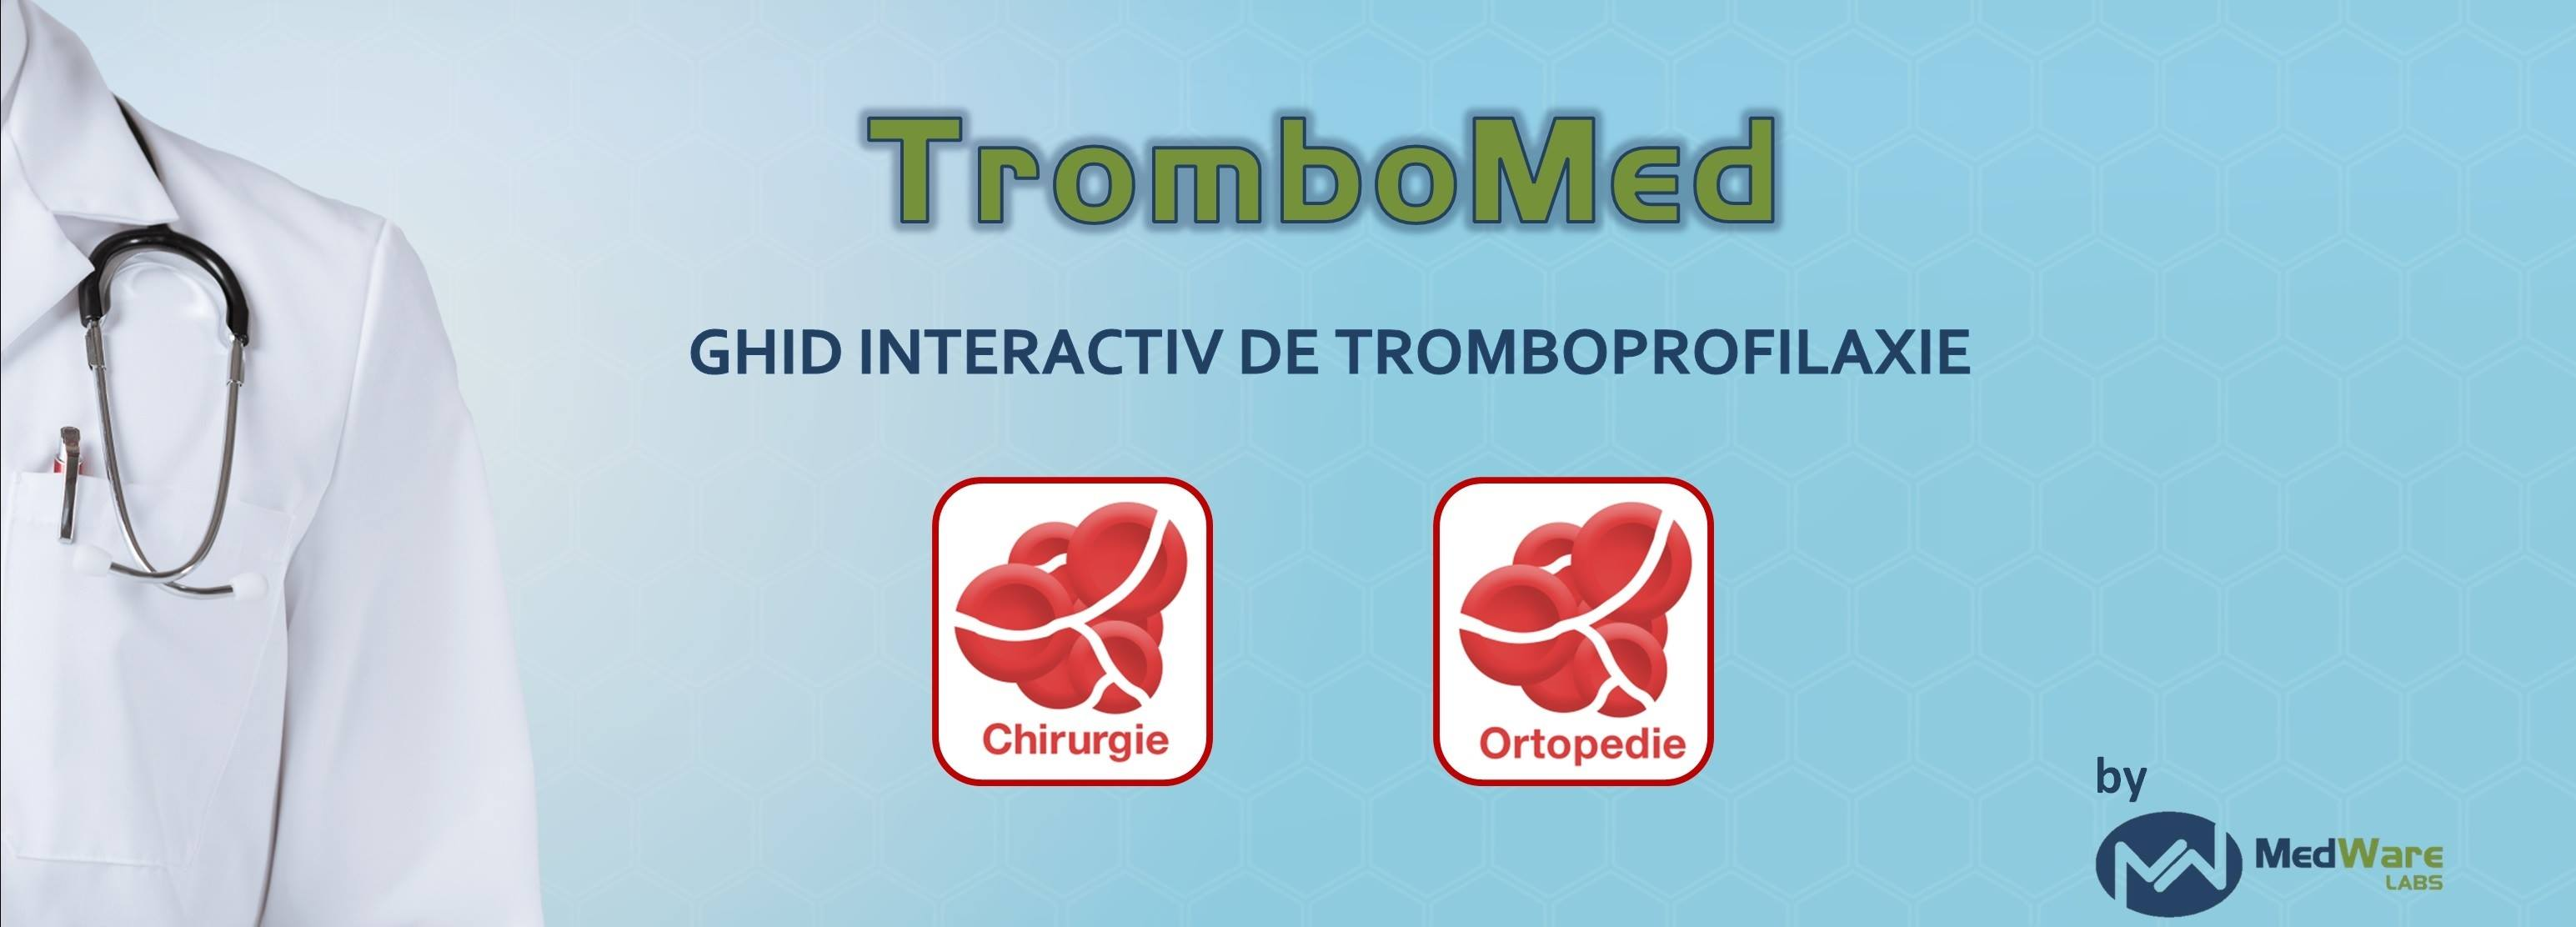 TromboMed - tromboprofilaxie